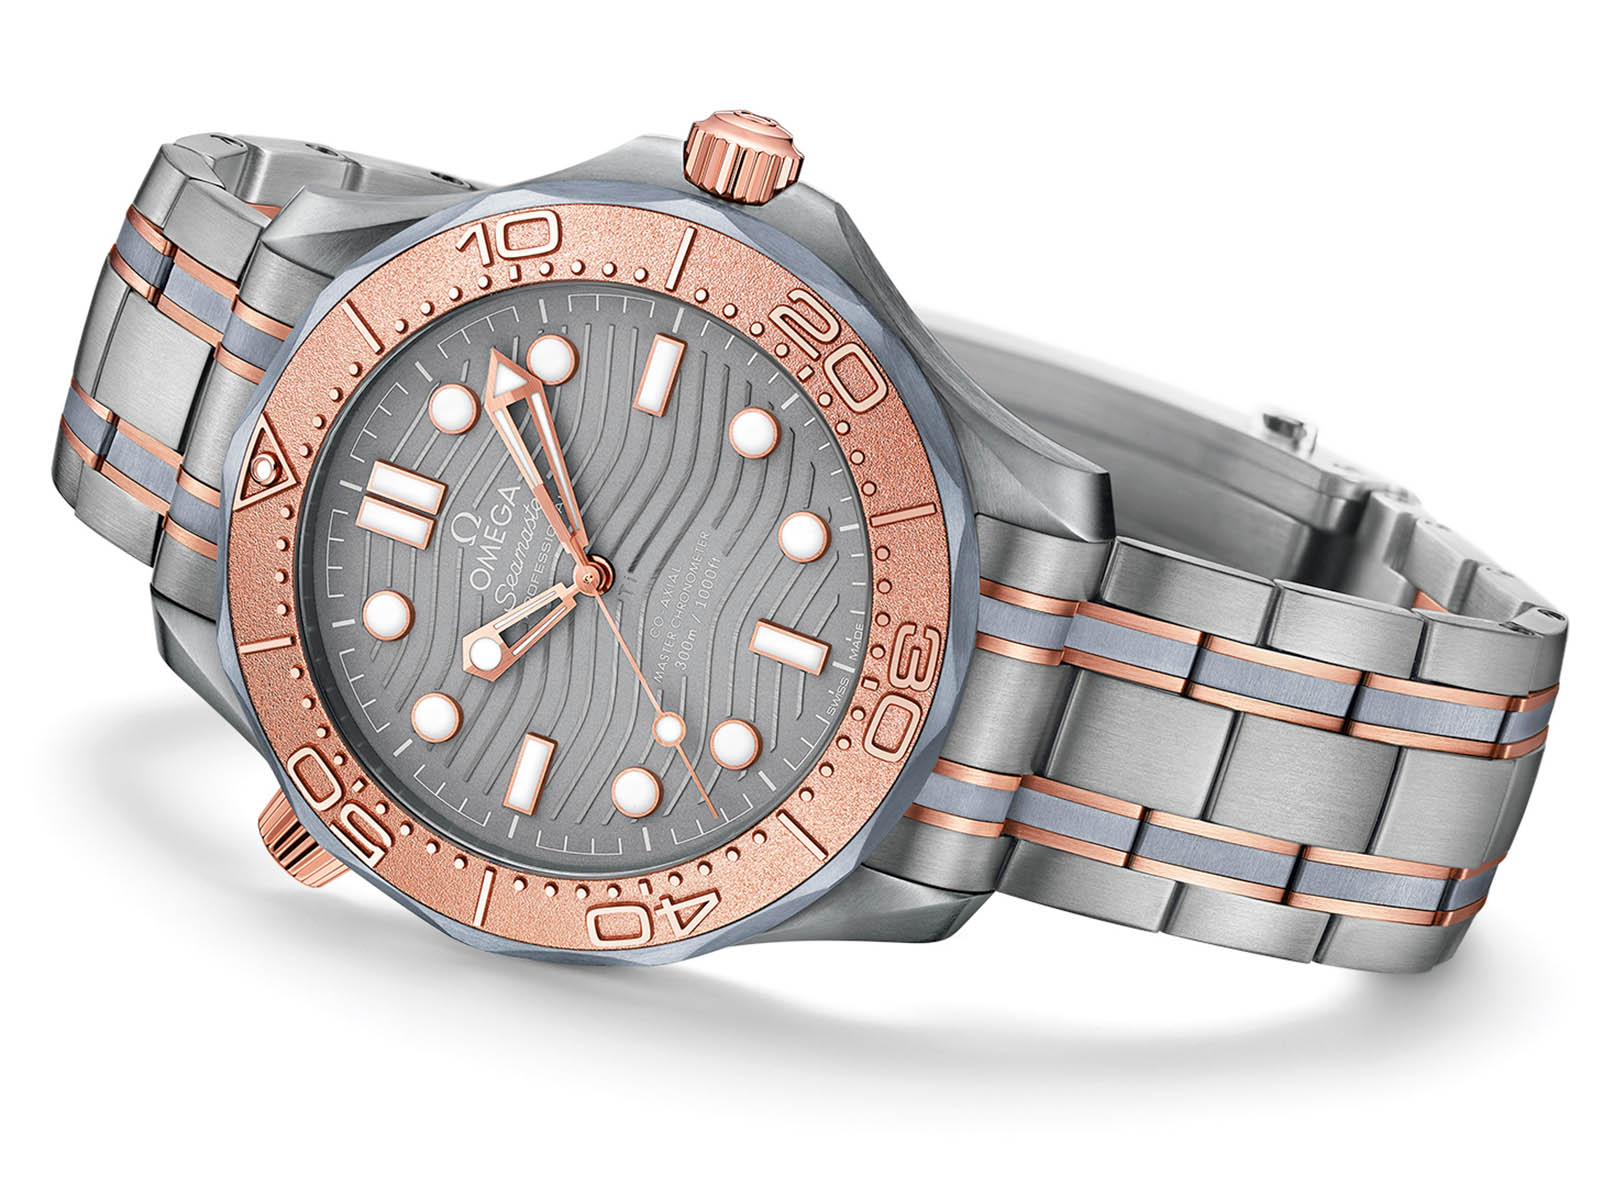 210-60-42-20-99-001-omega-seamaster-diver-300m-tantalum-1.jpg